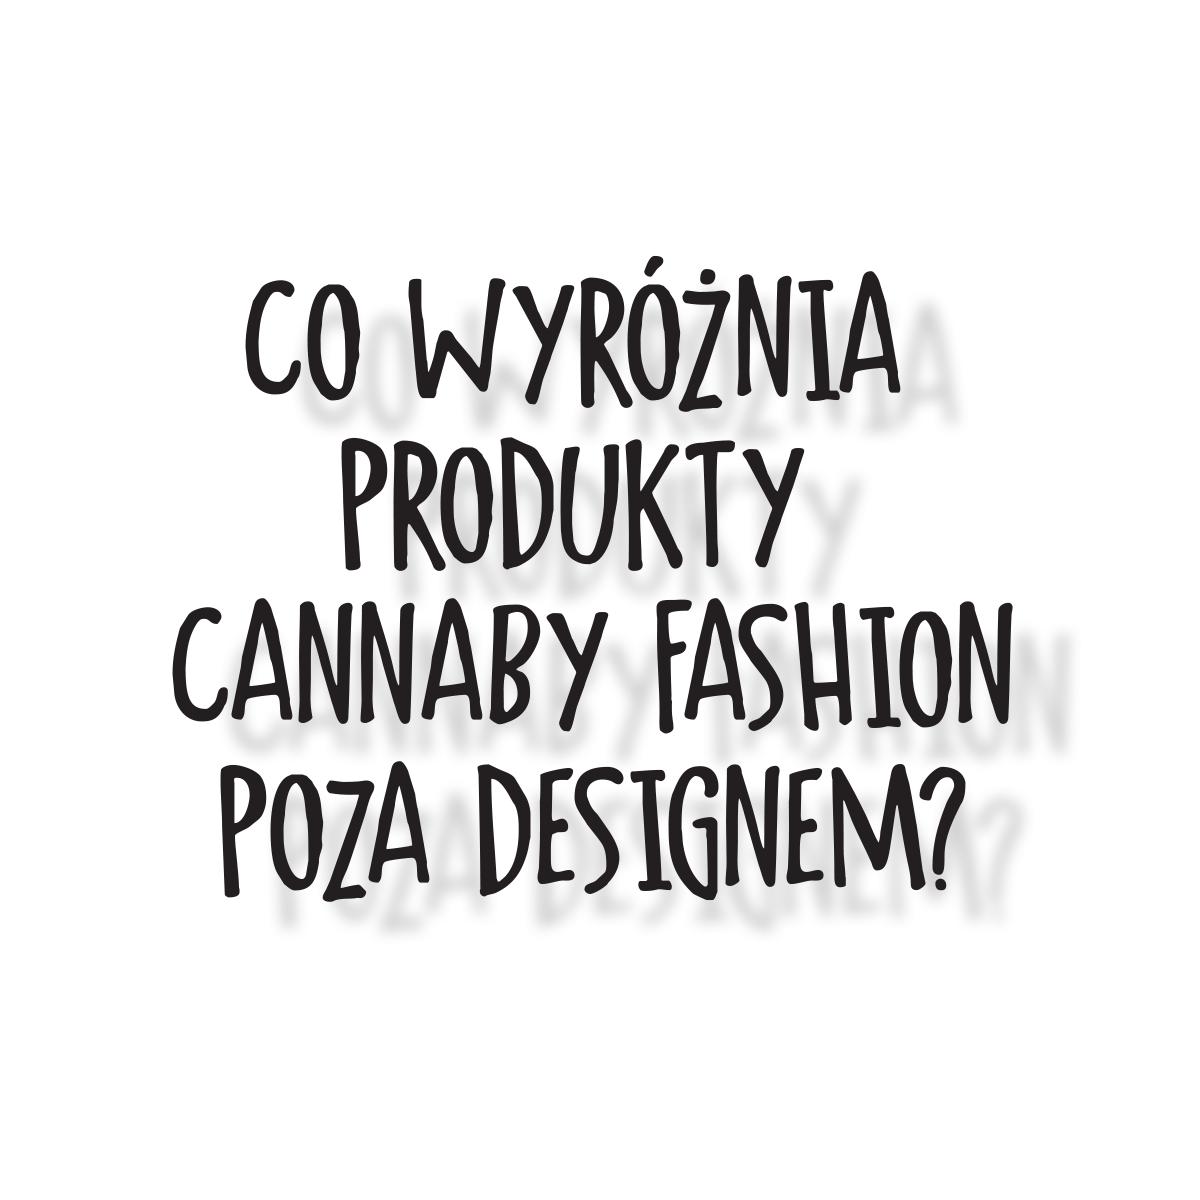 co wyróżnia modele Cannaby Fashion?